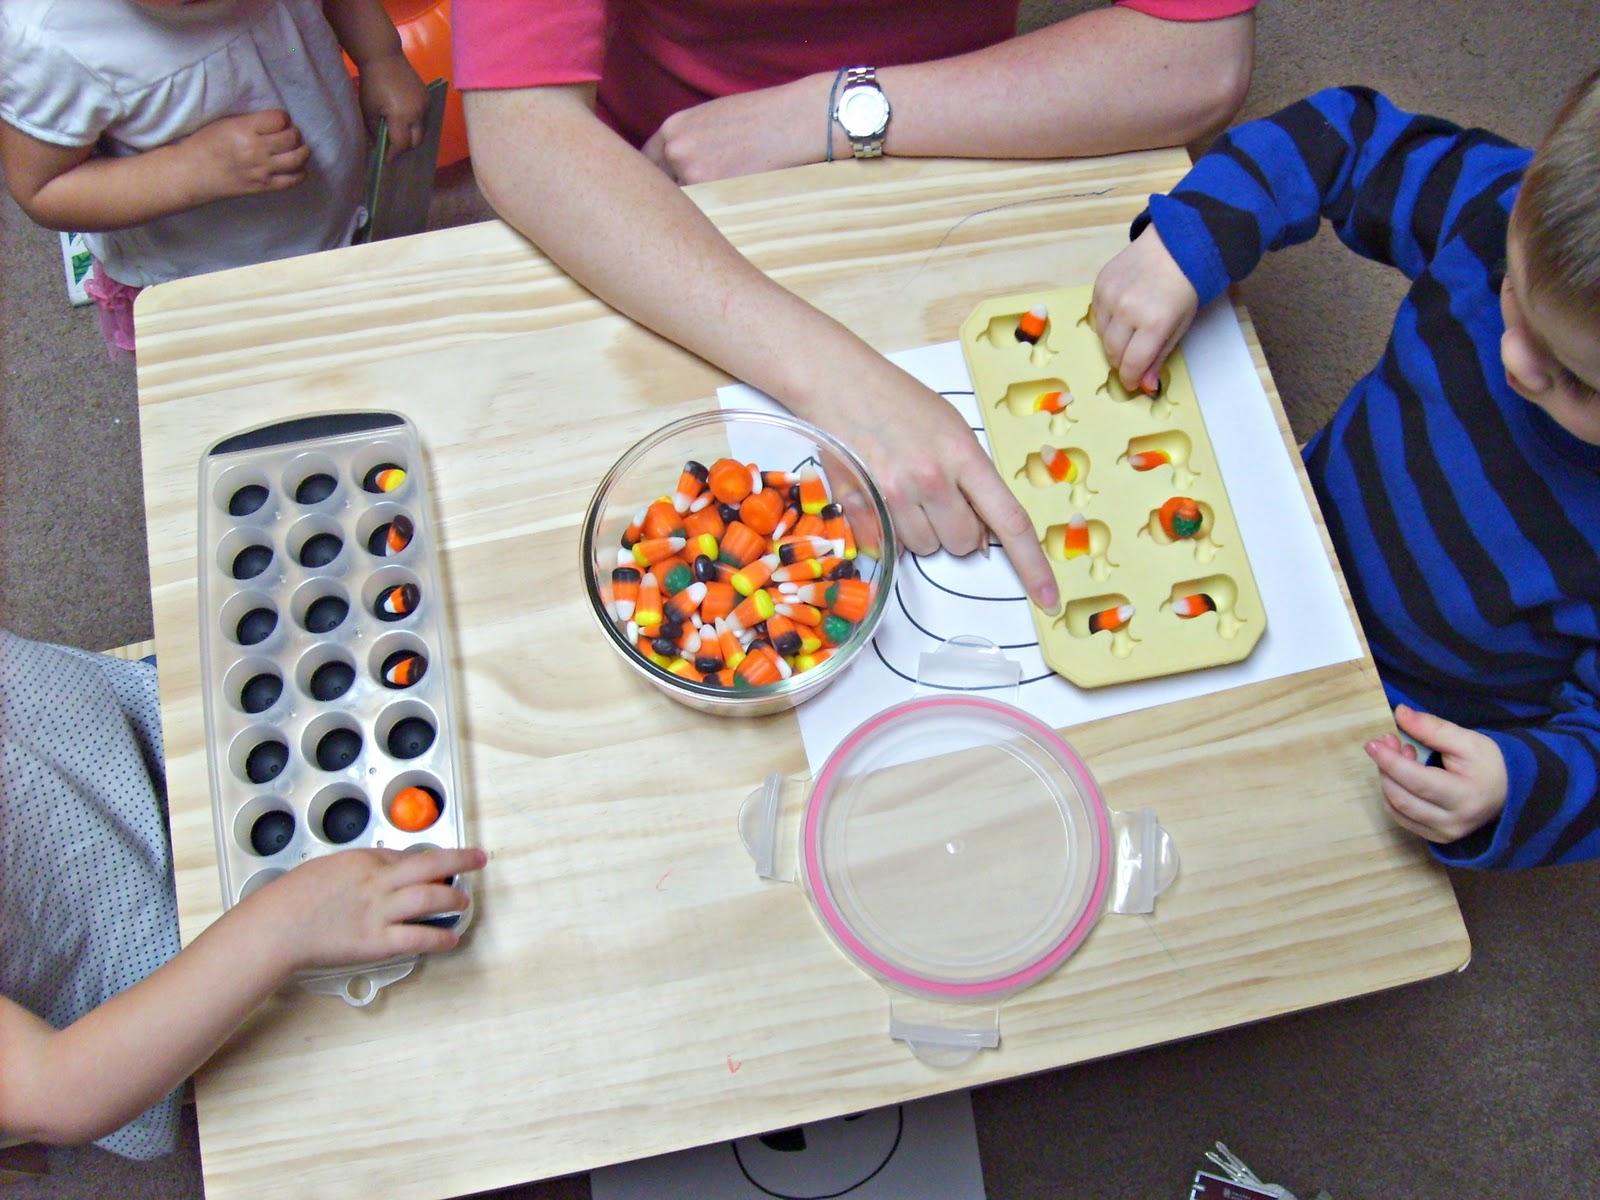 The red kitchen 4 fun halloween preschool activities for Halloween party games for preschoolers